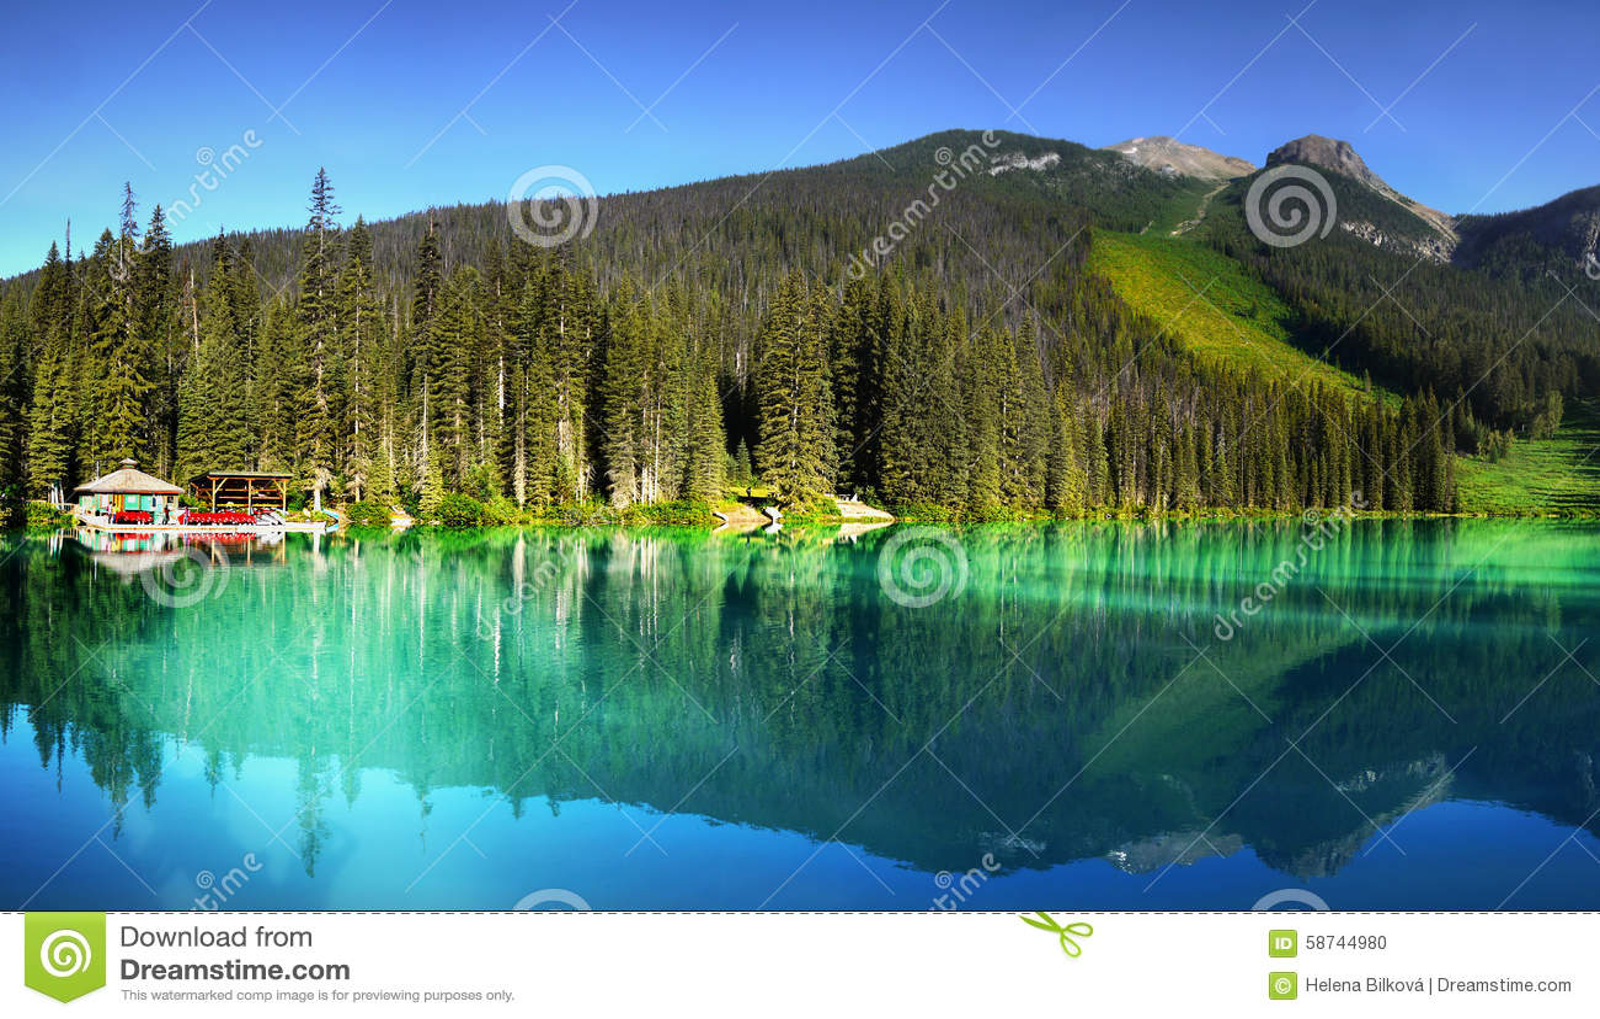 British Columbia, Vancouver, Emerald Lake